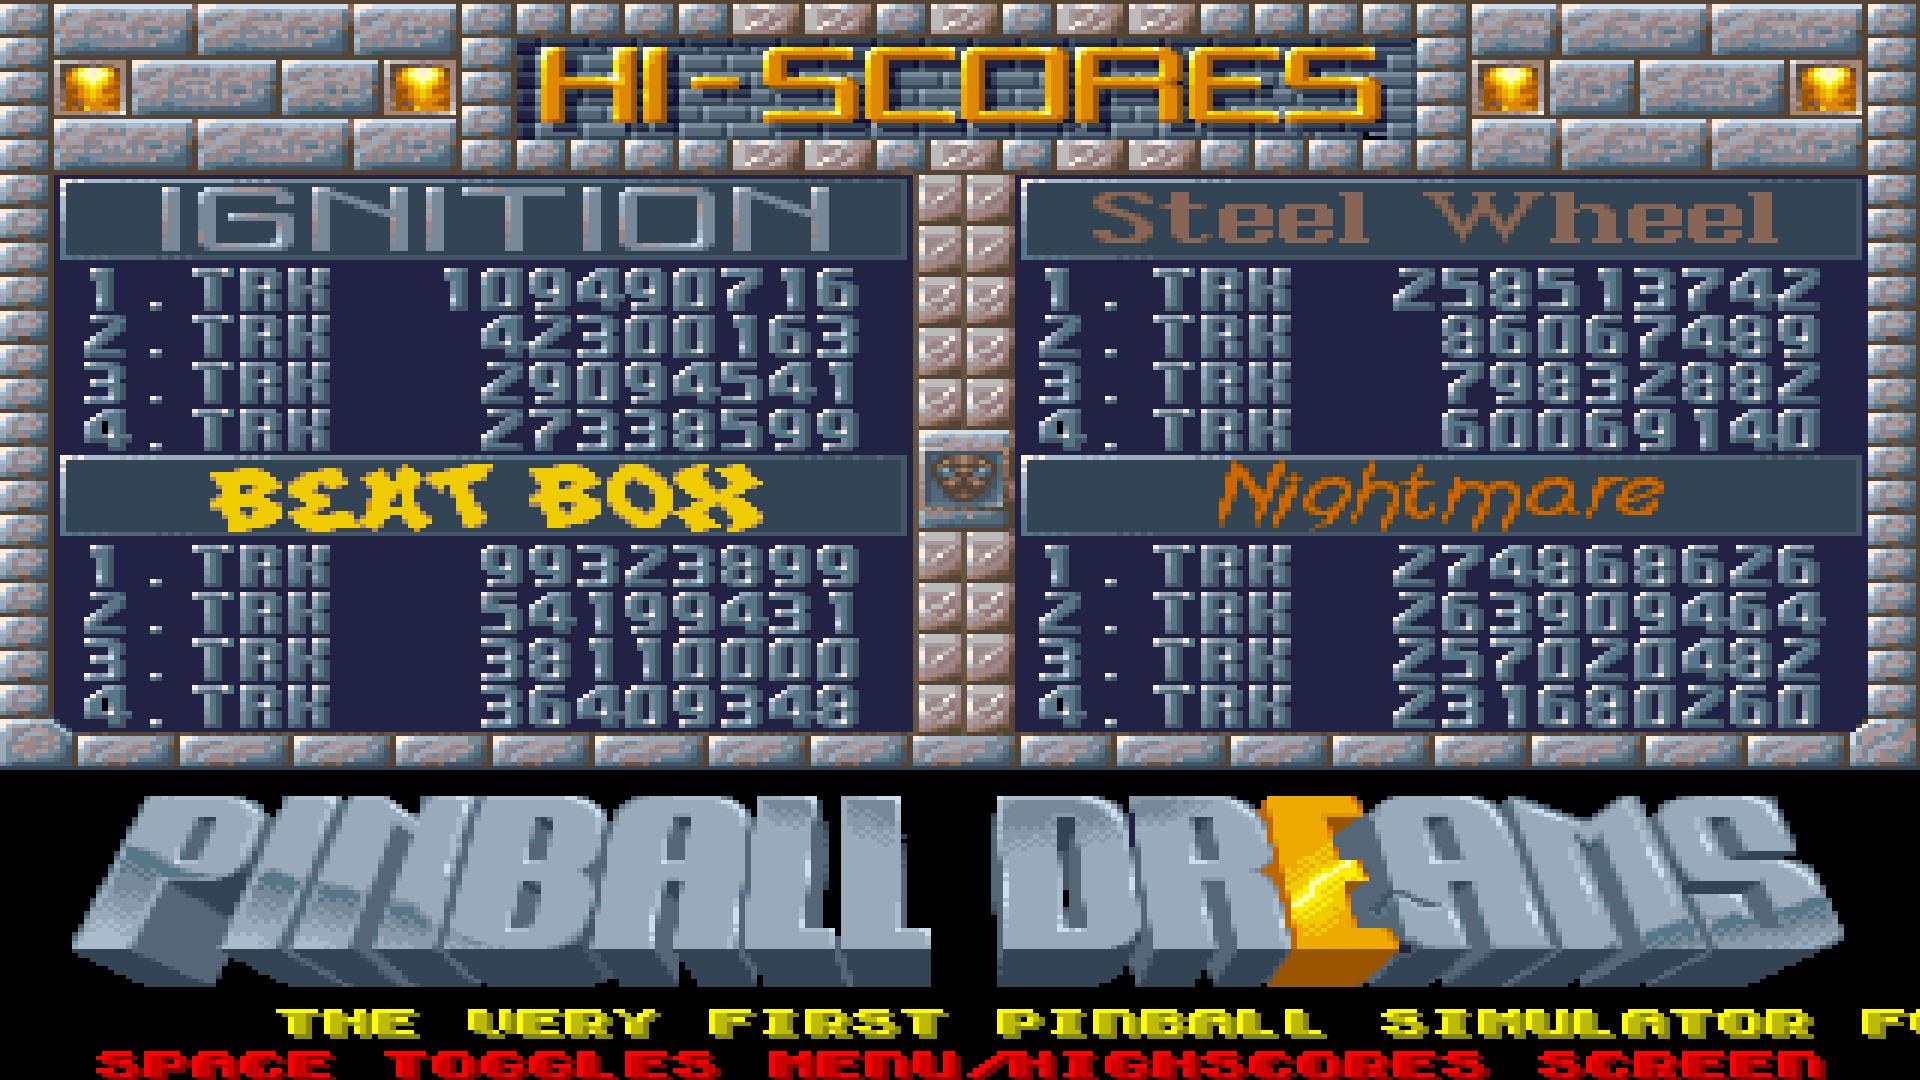 Pinball Dreams: Steel Wheel 258,513,742 points